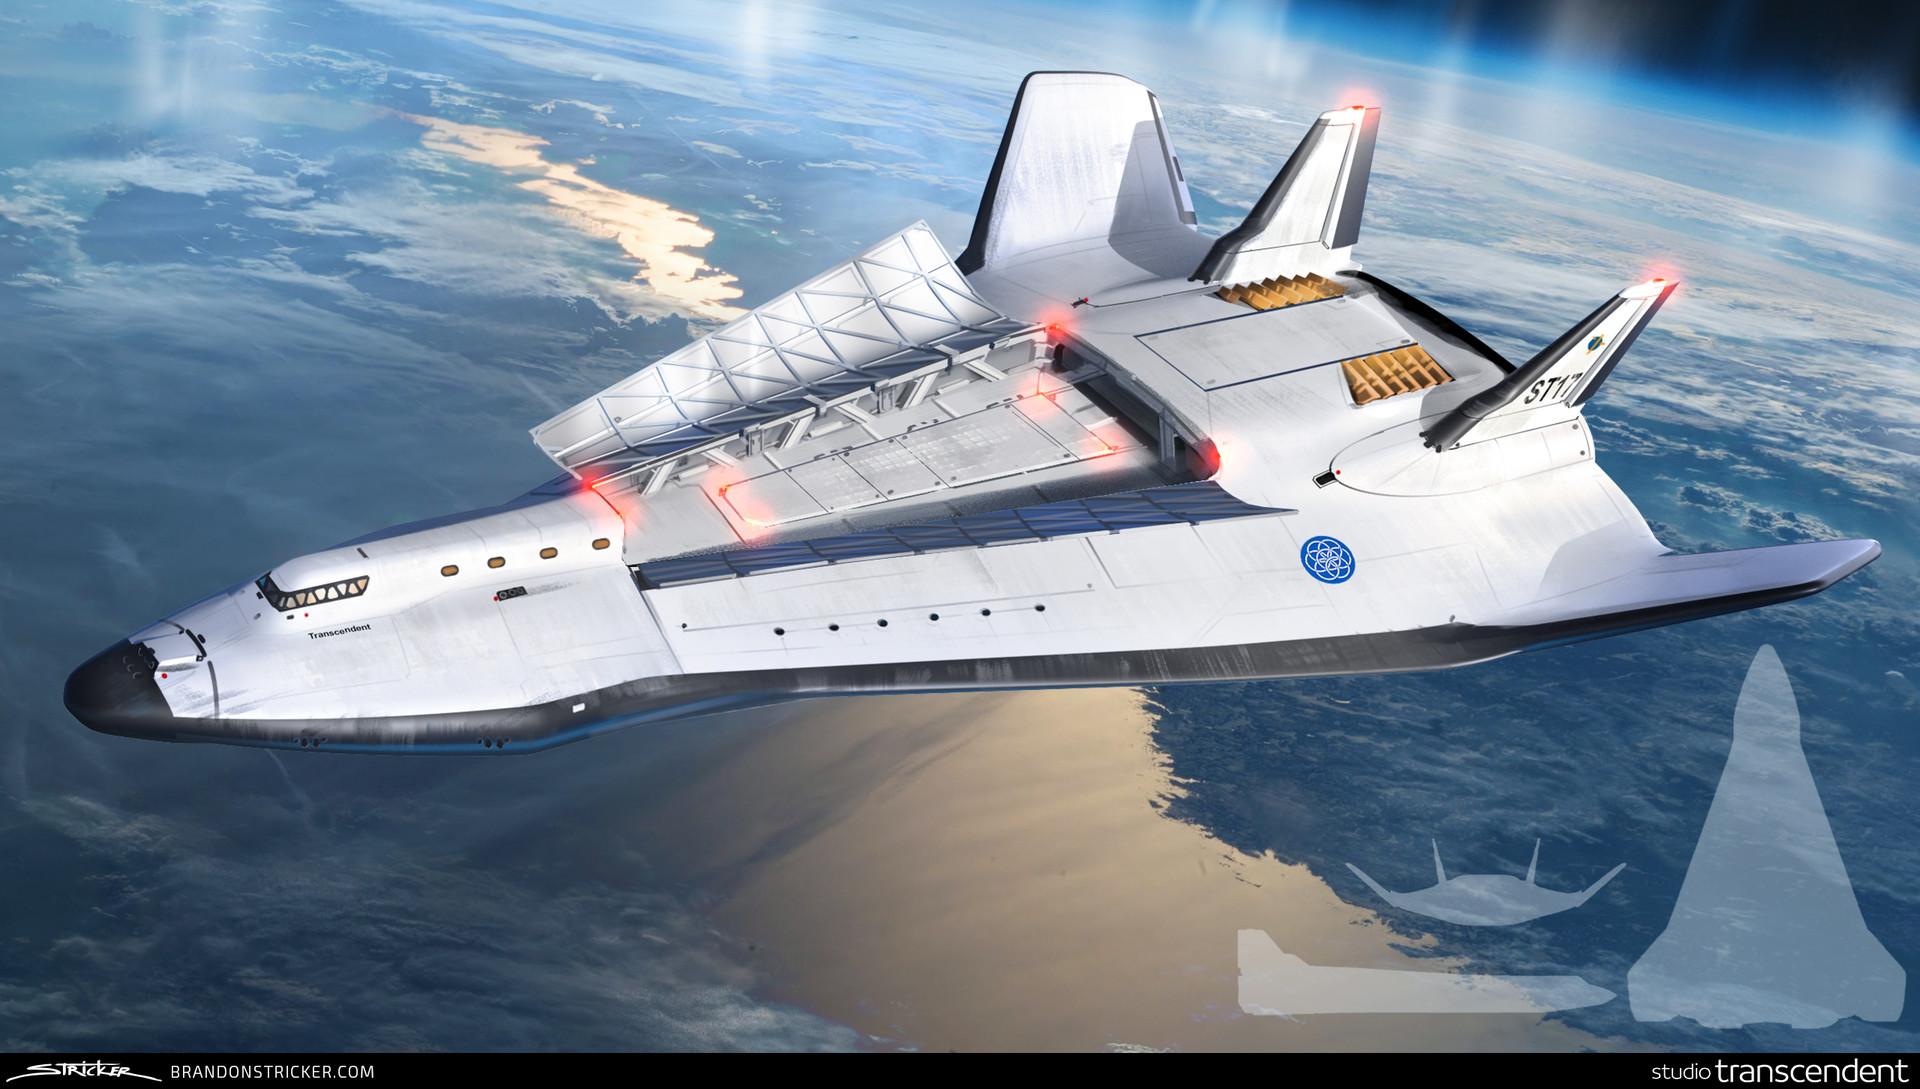 Nasa New Space Shuttle Design